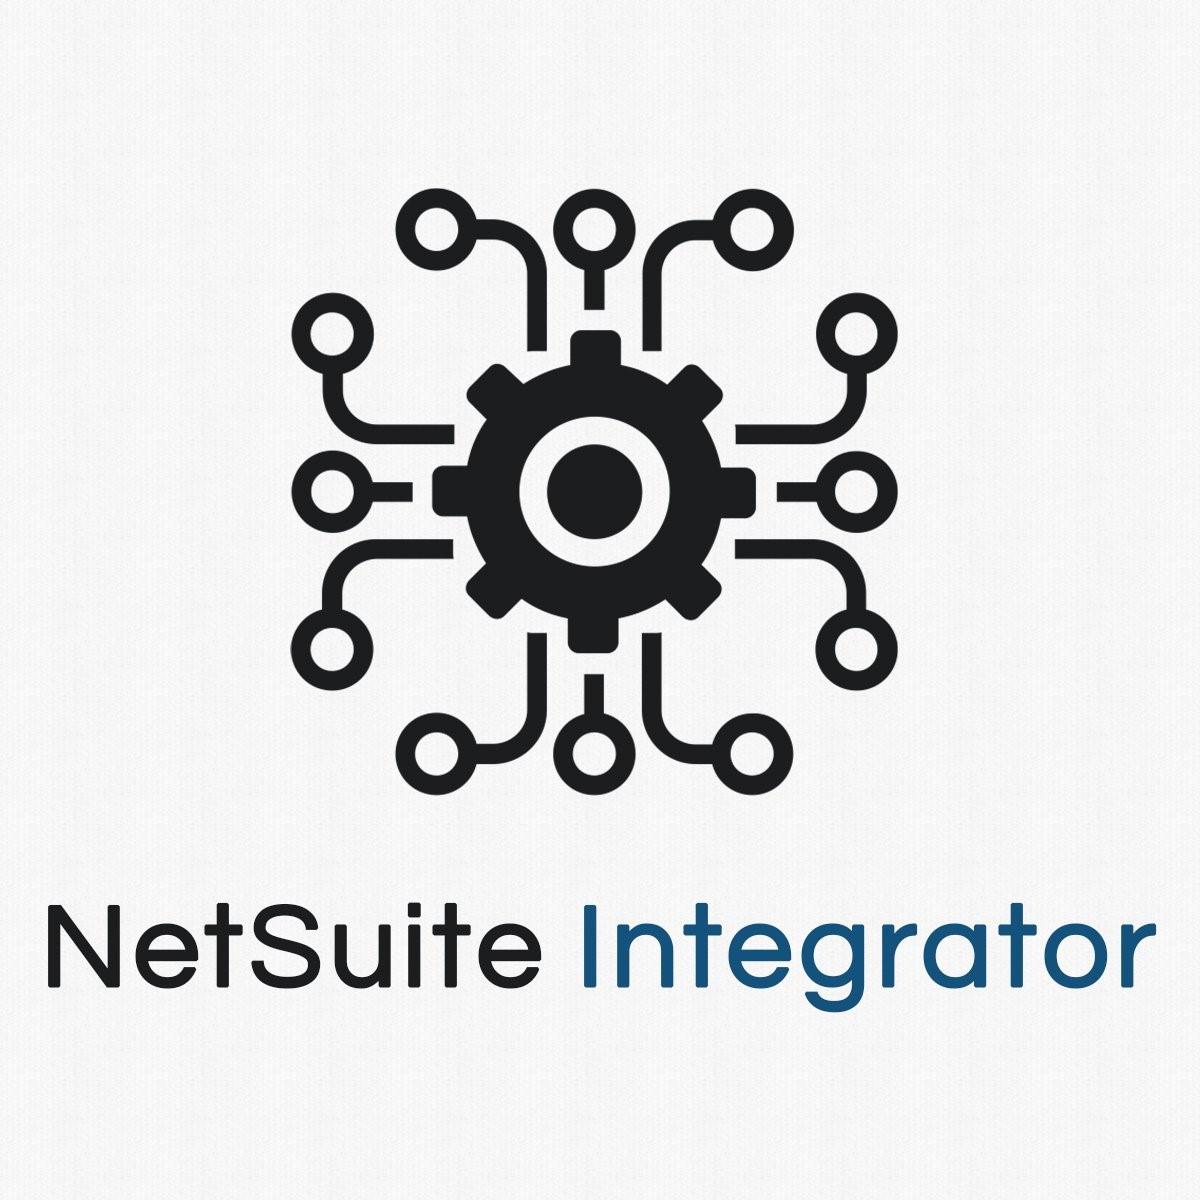 Shopify NetSuite Integration app by Webbee esolutions pvt ltd.